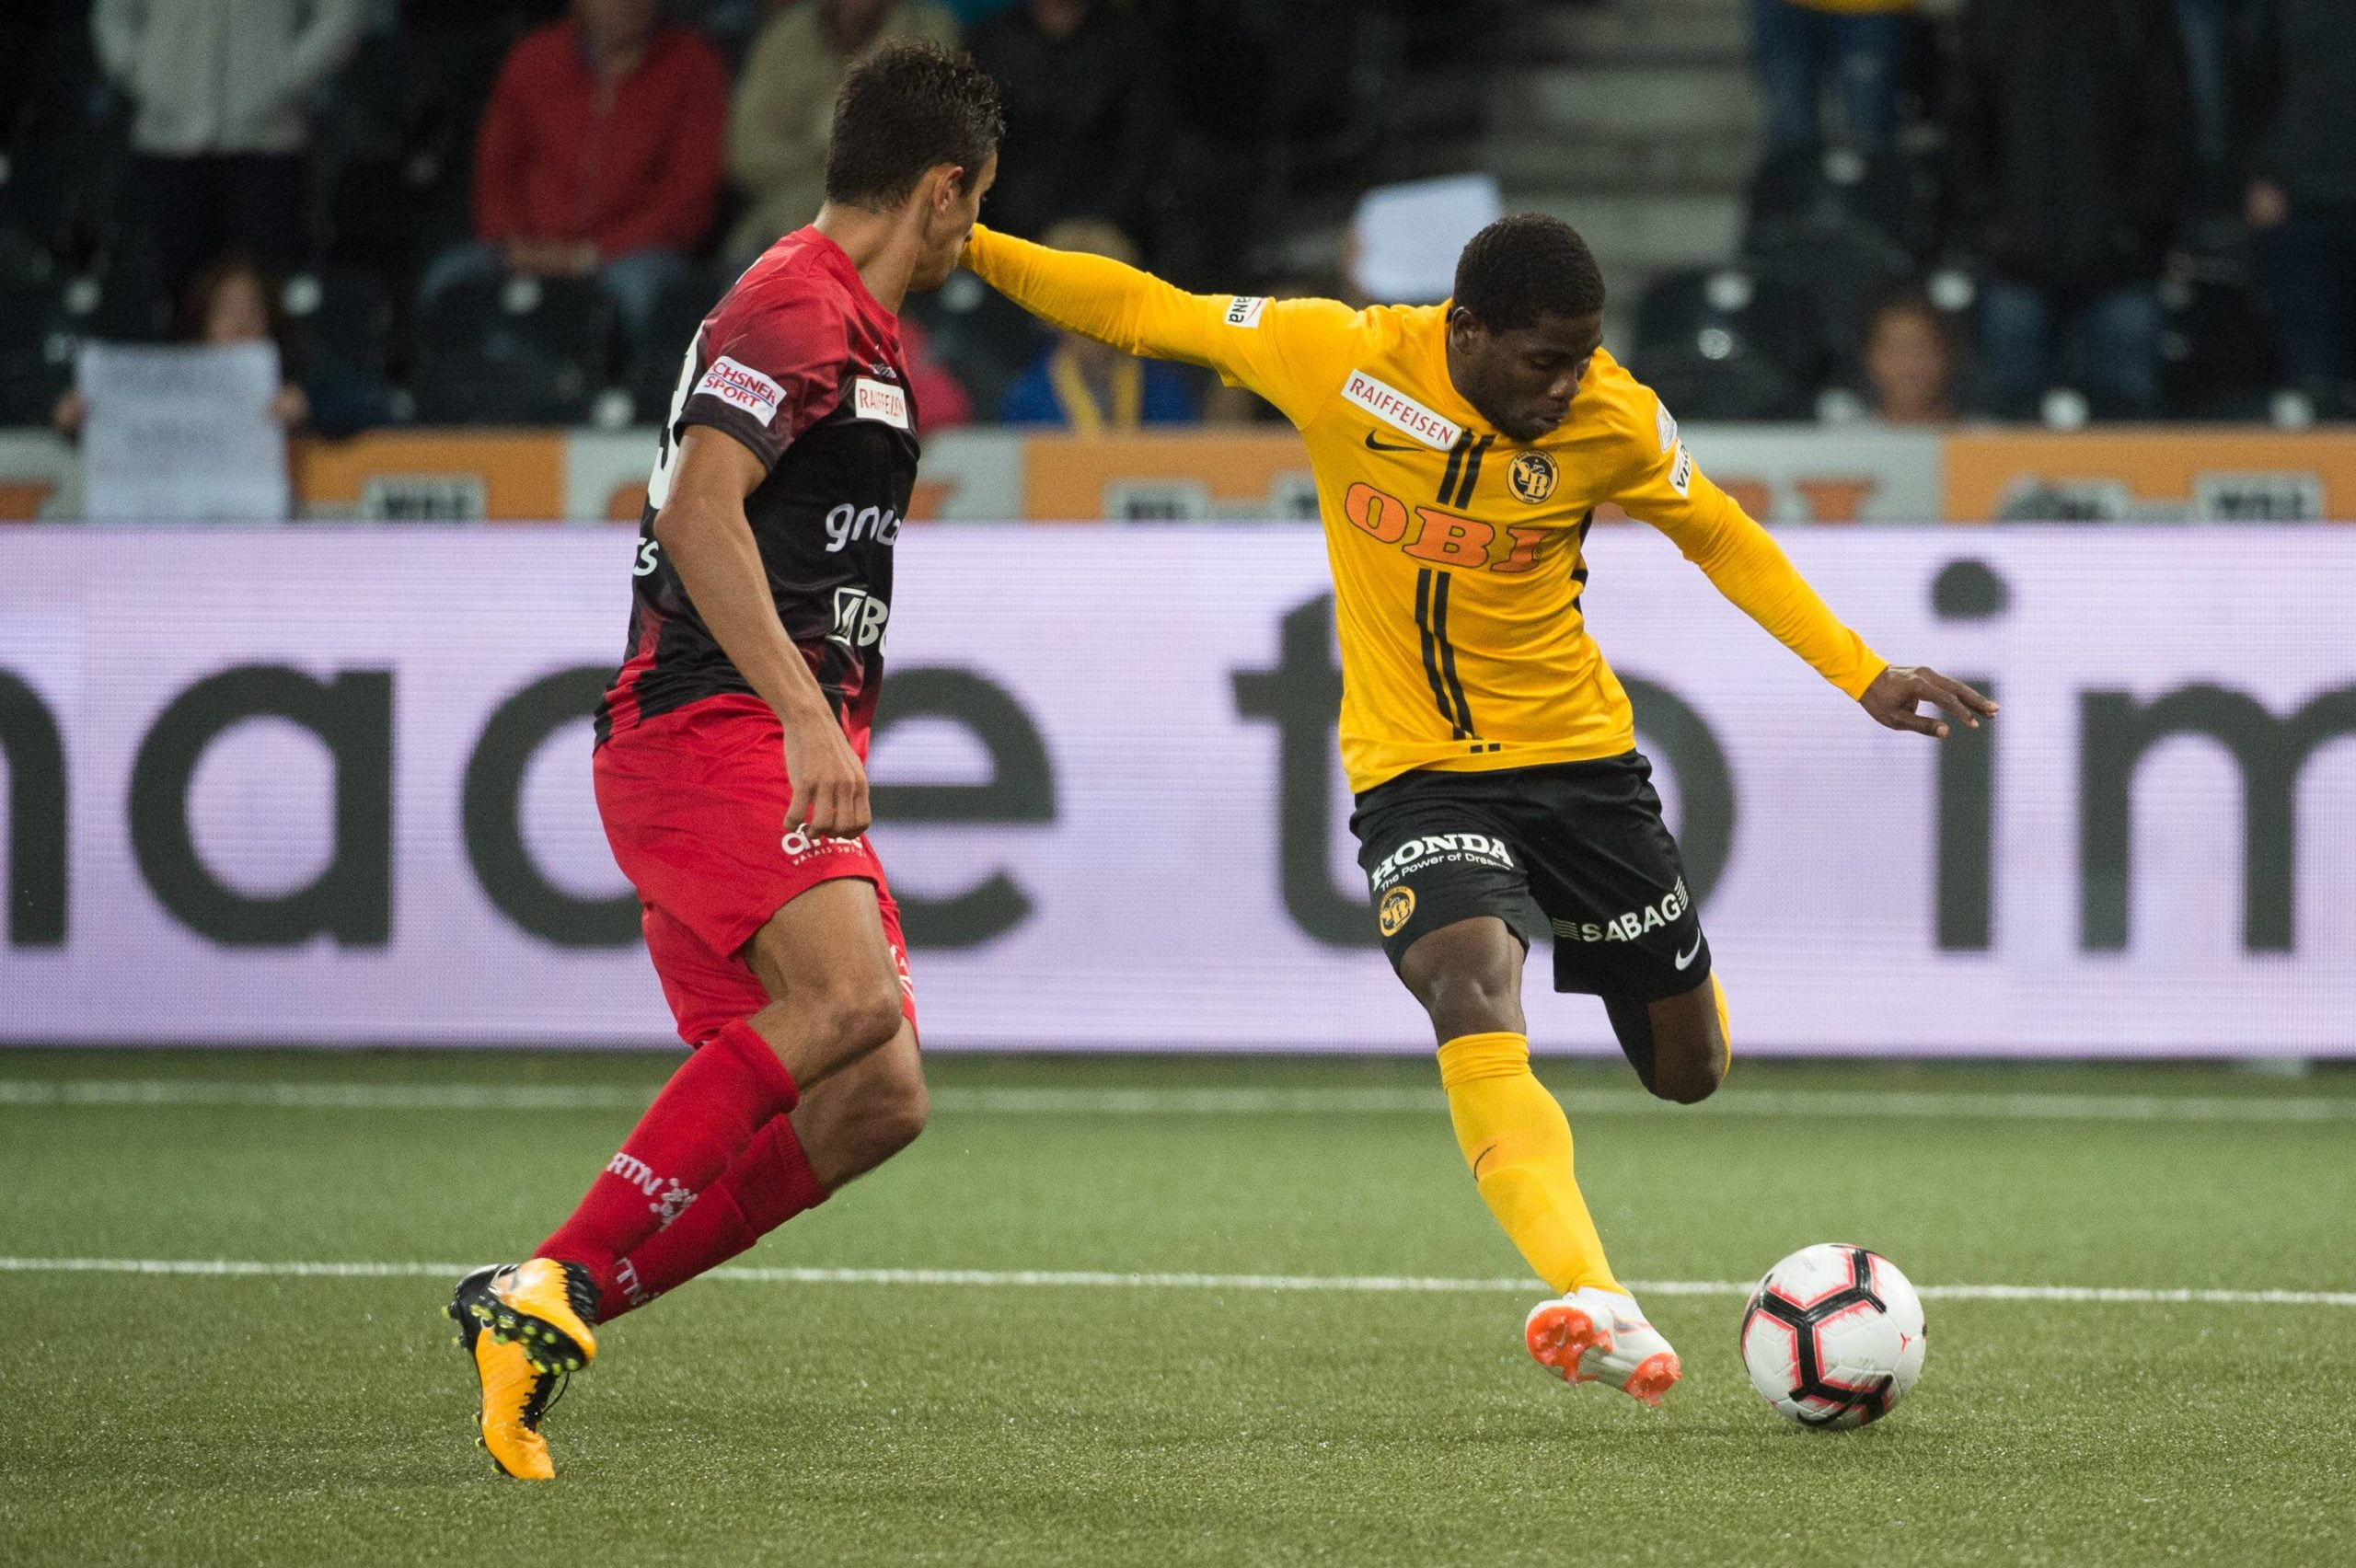 Neuchâtel Xamax FCS - BSC Young Boys Wett Tipp, Quoten, Prognose